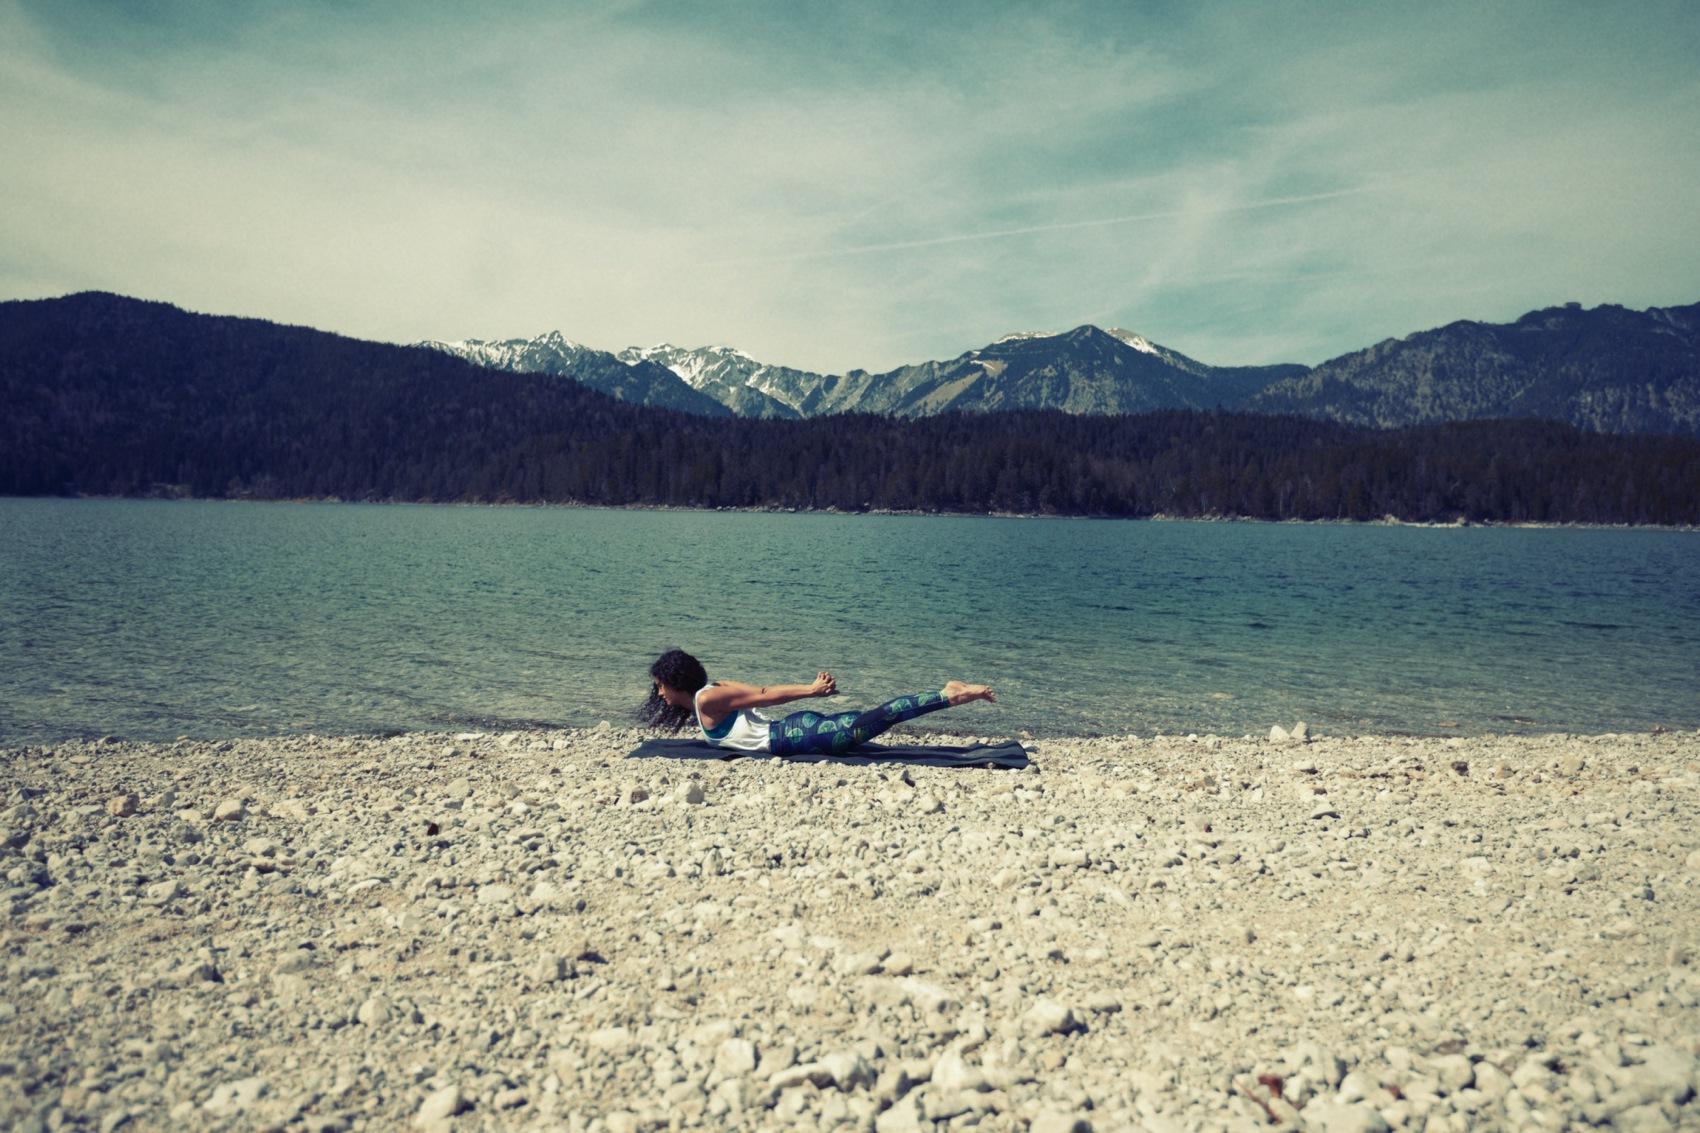 Yoga-for-Surfers-7-Shalabasana-Full-Locust-Pose-Conny-Marshaus-Anna-Kathalina-Langer